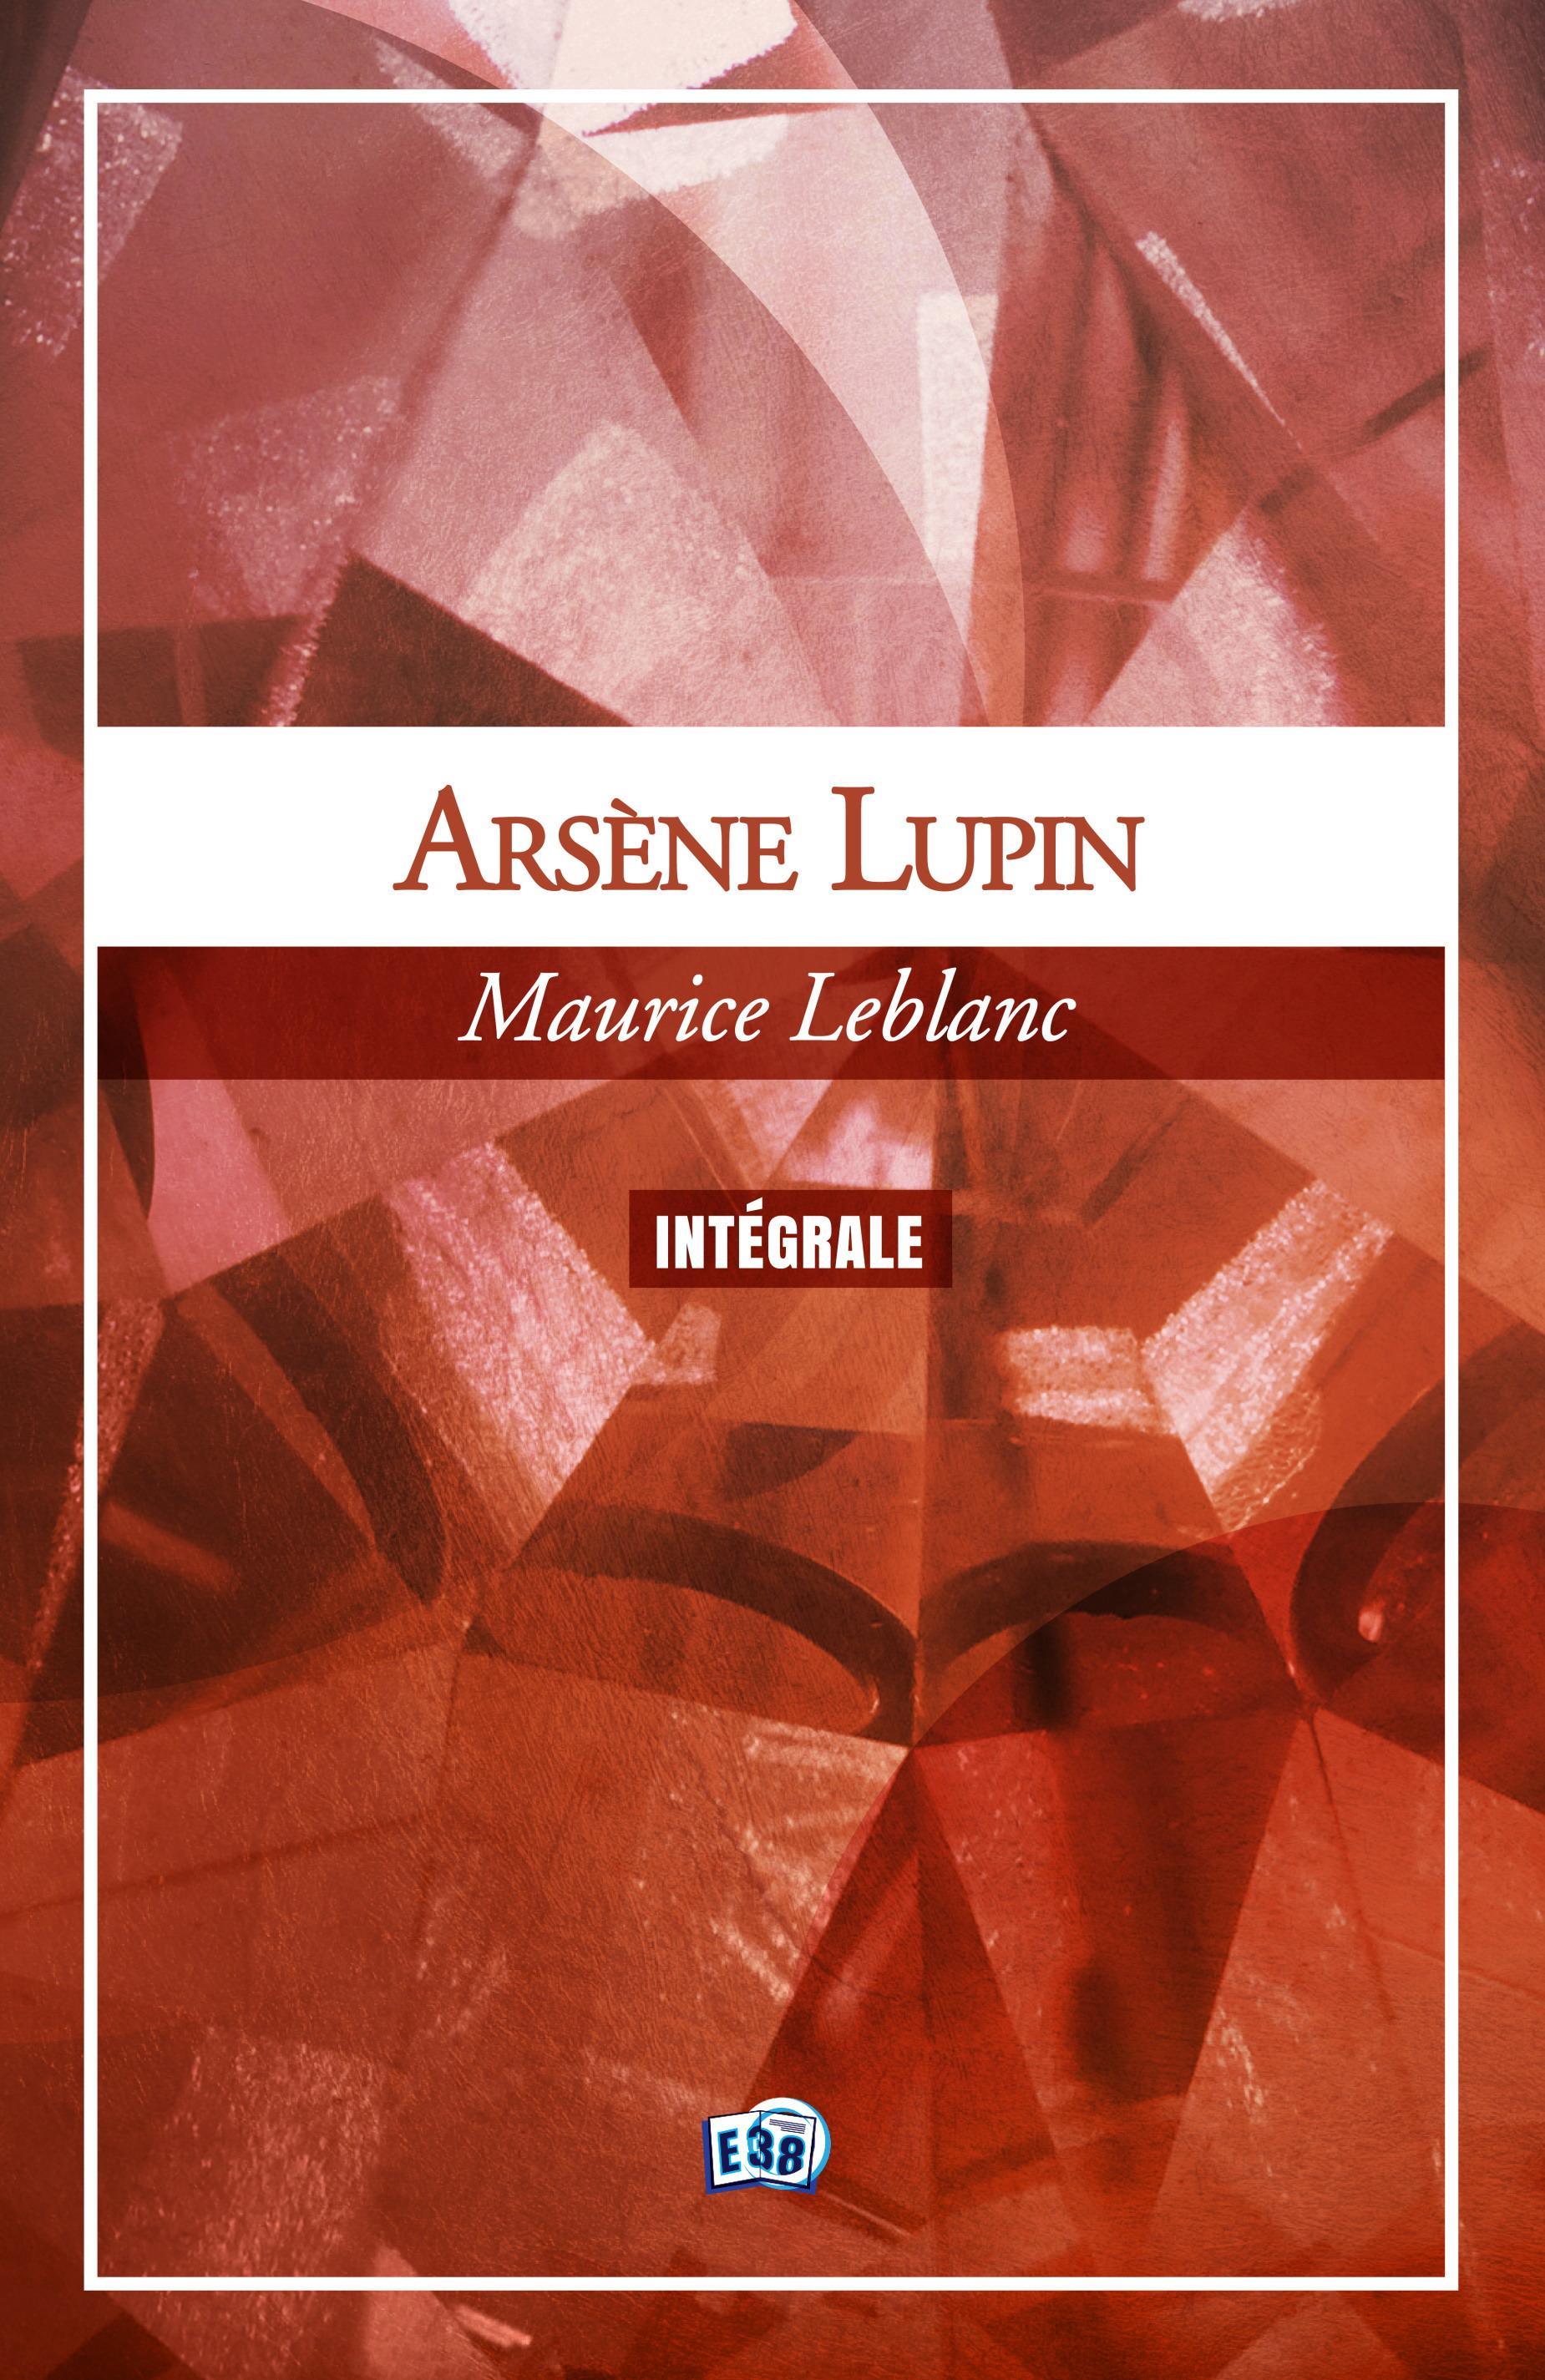 Arsène Lupin, l'Intégrale